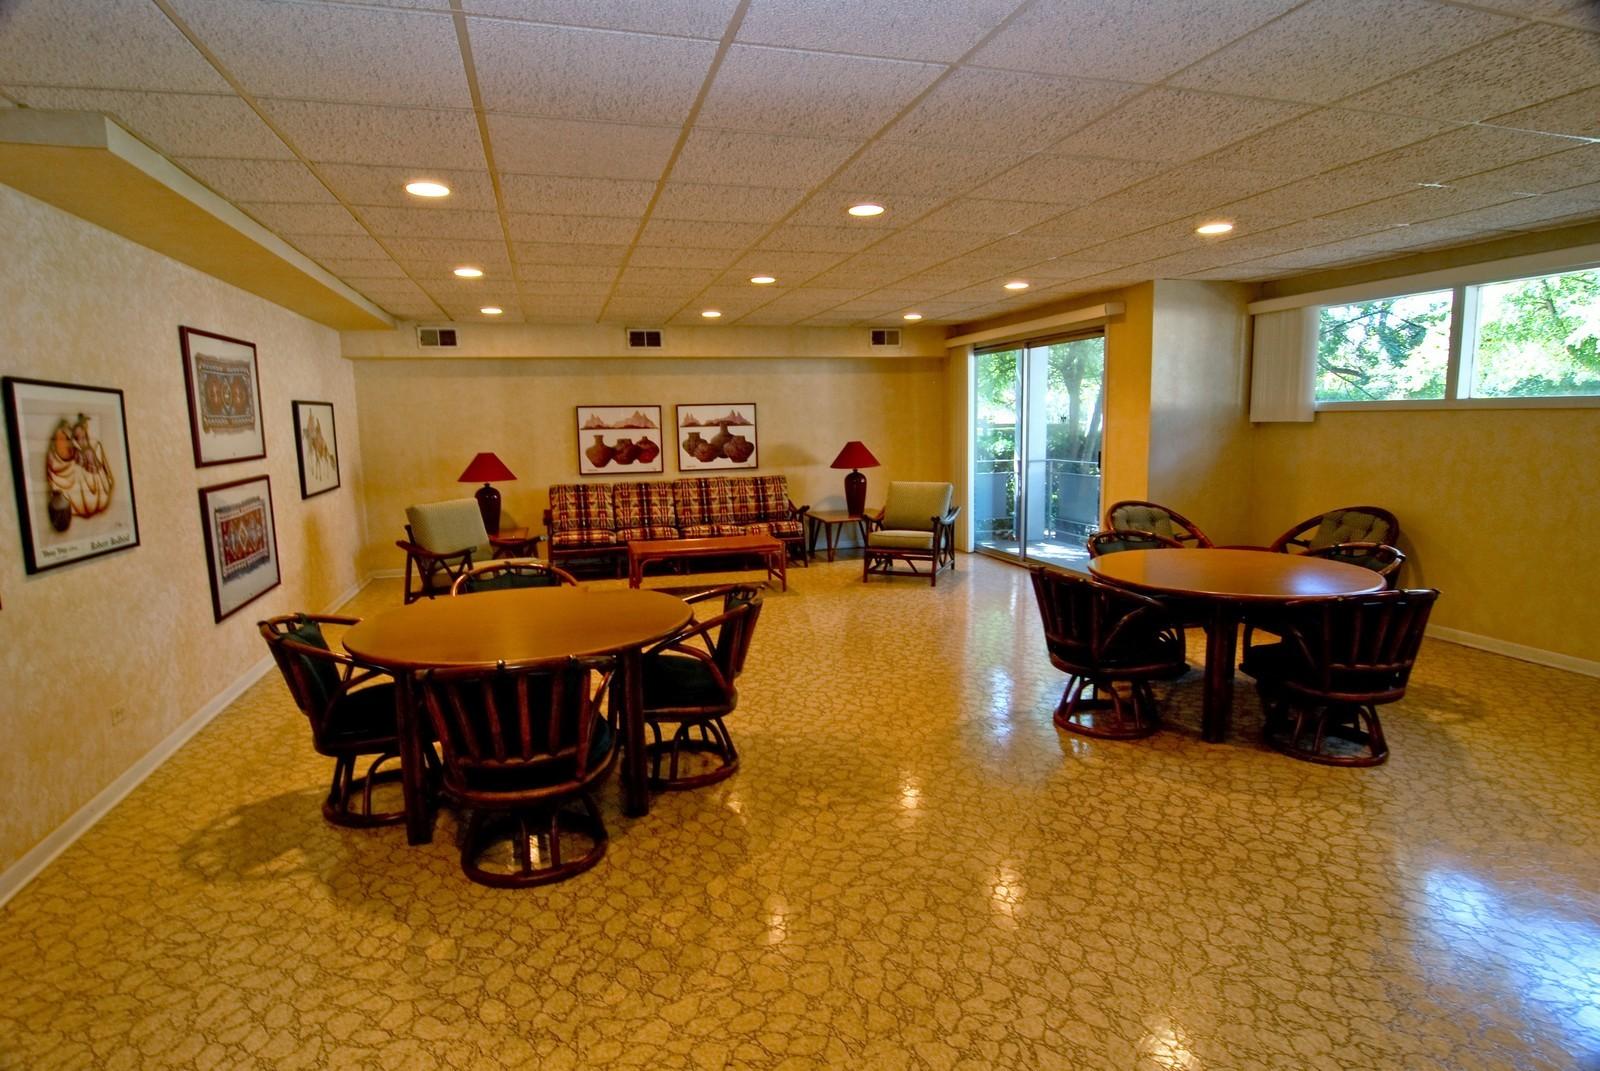 Real Estate Photography - 1535 Park, Unit 305, River Forest, IL, 60305 - Location 1